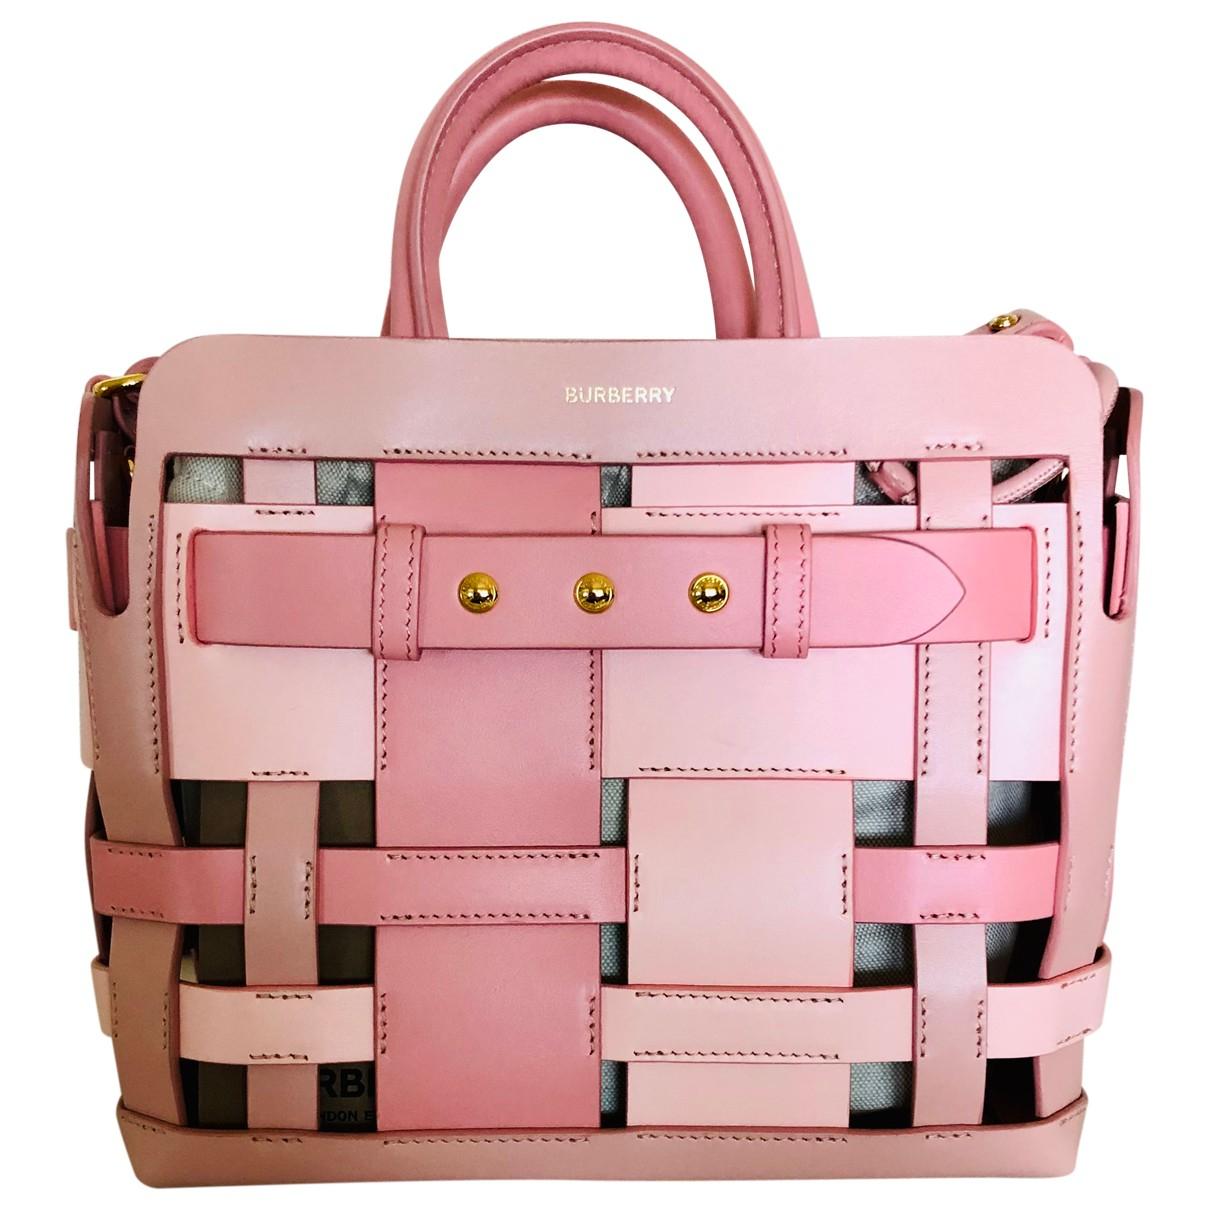 Burberry The Belt Handtasche in  Rosa Leder